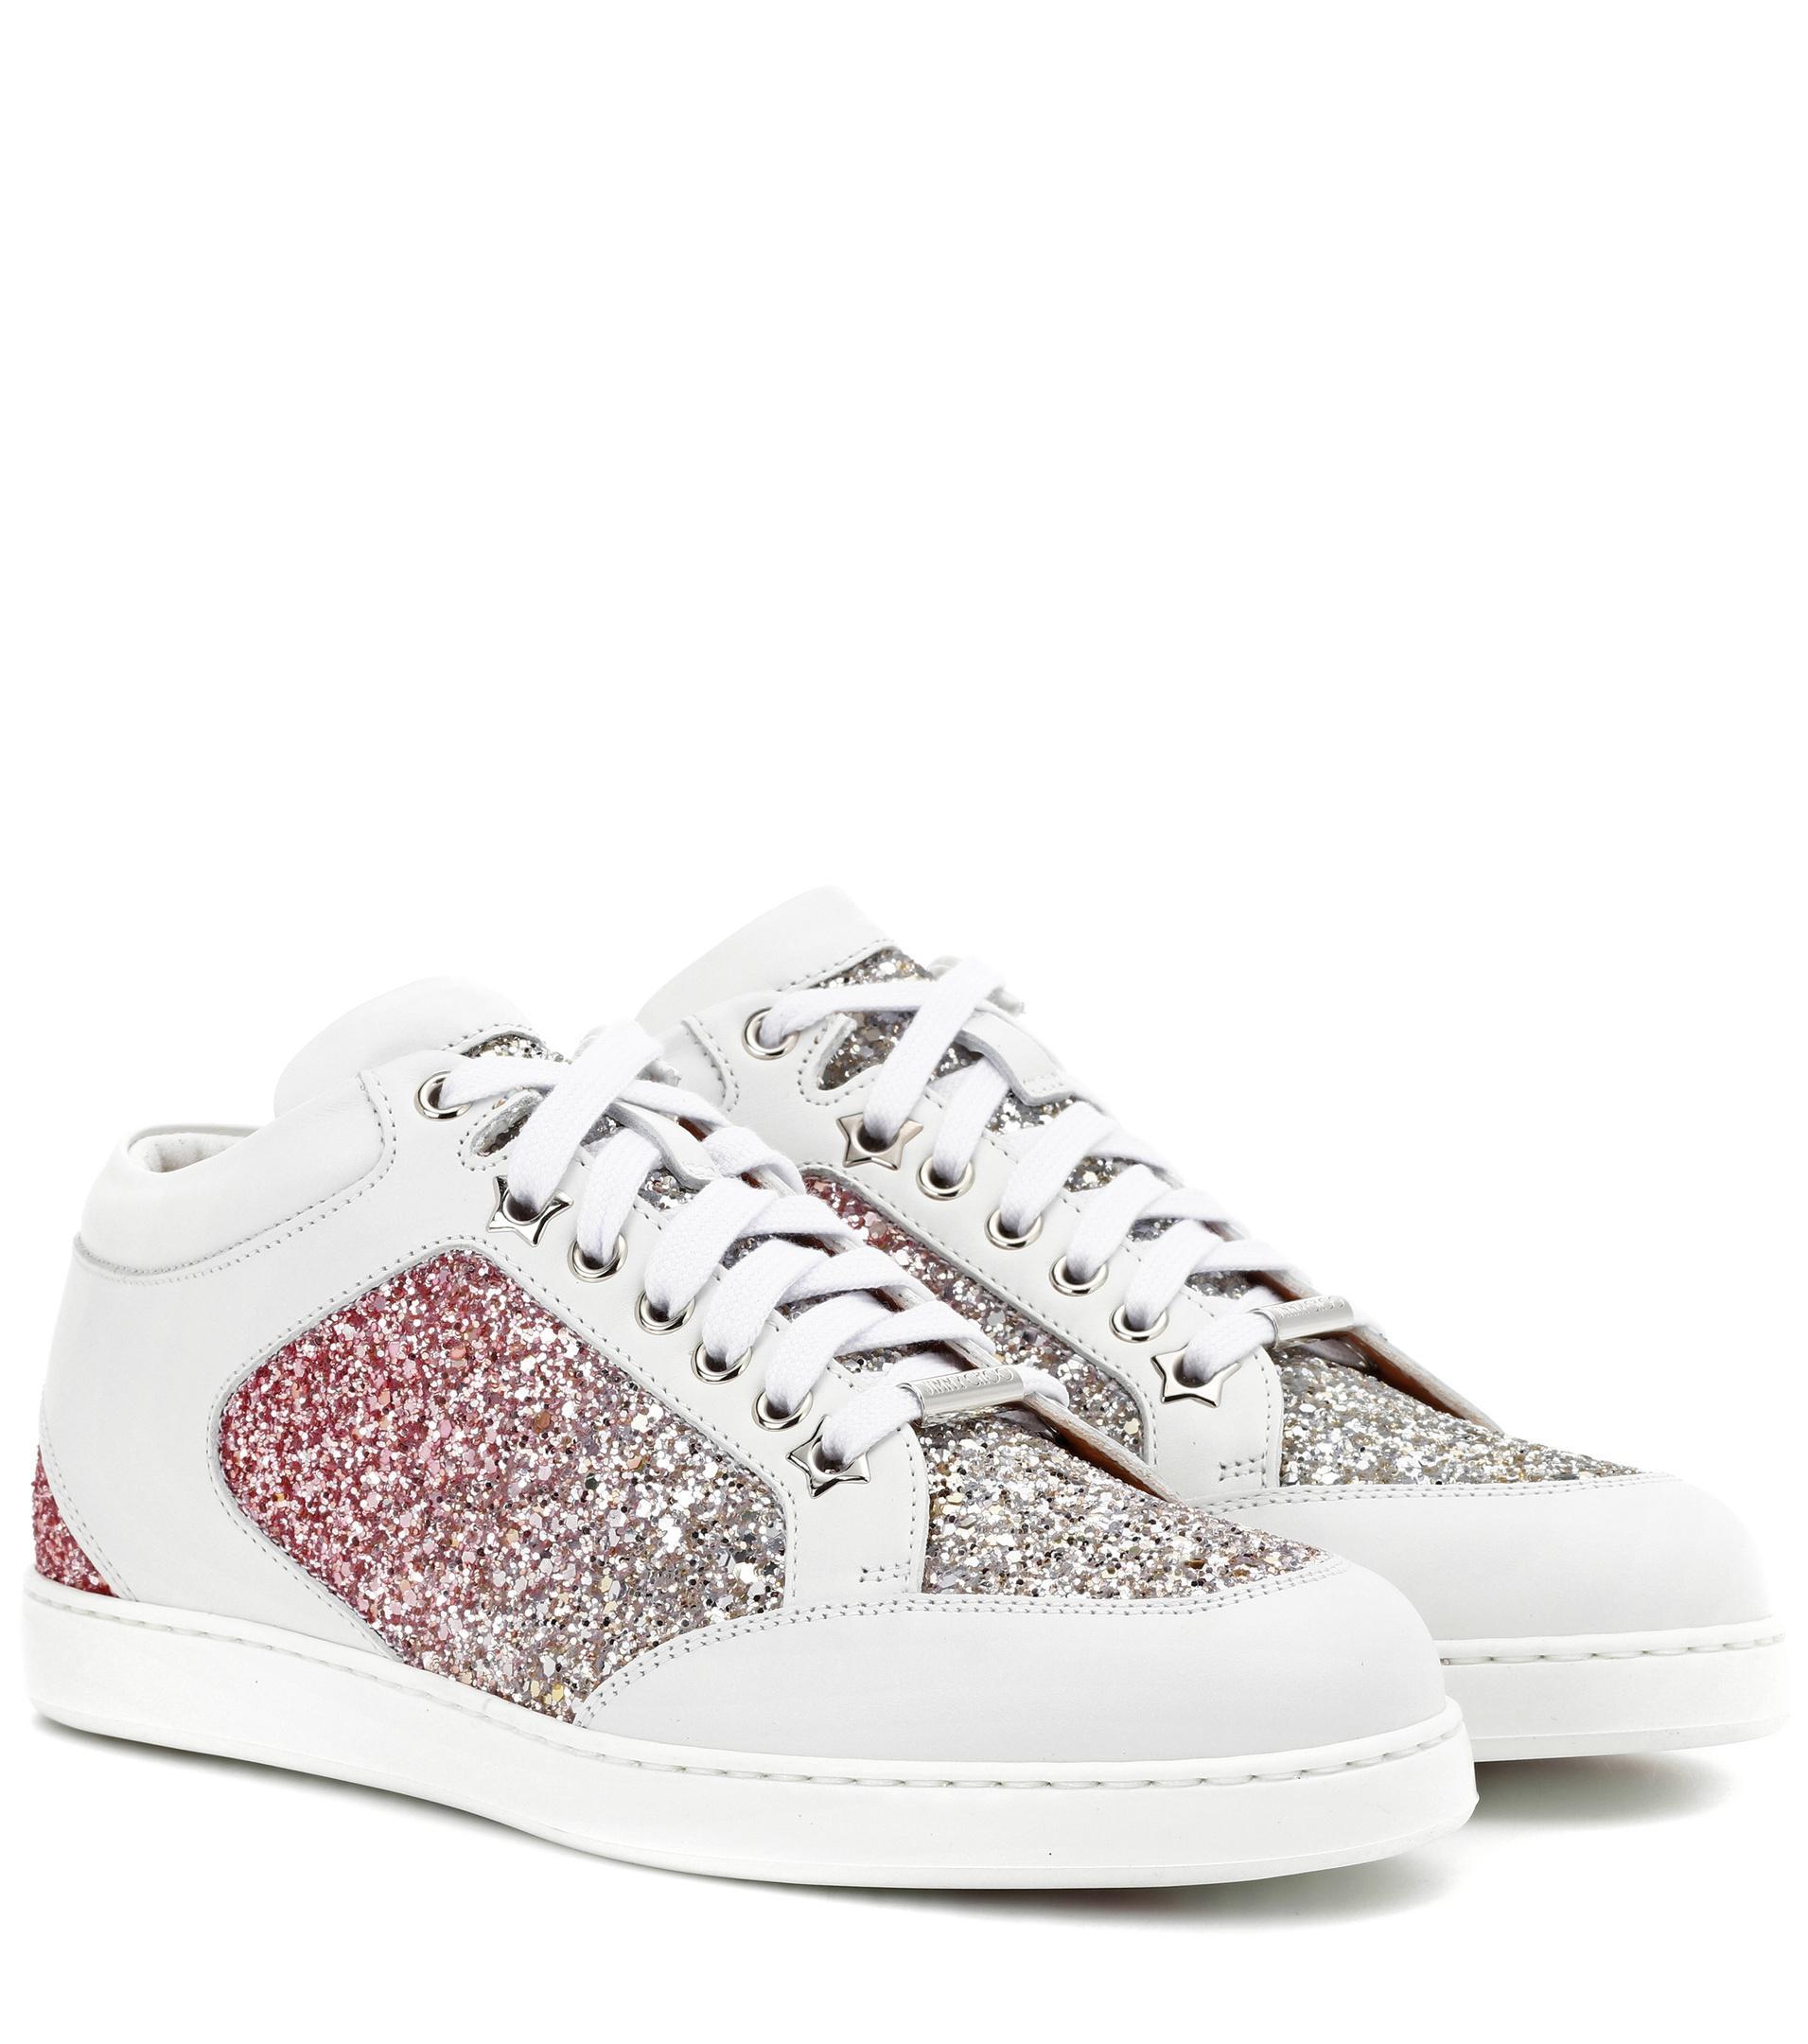 Sneakers MIAMI calfskin glitter Glitter Logo silver Jimmy Choo London OJ2p0